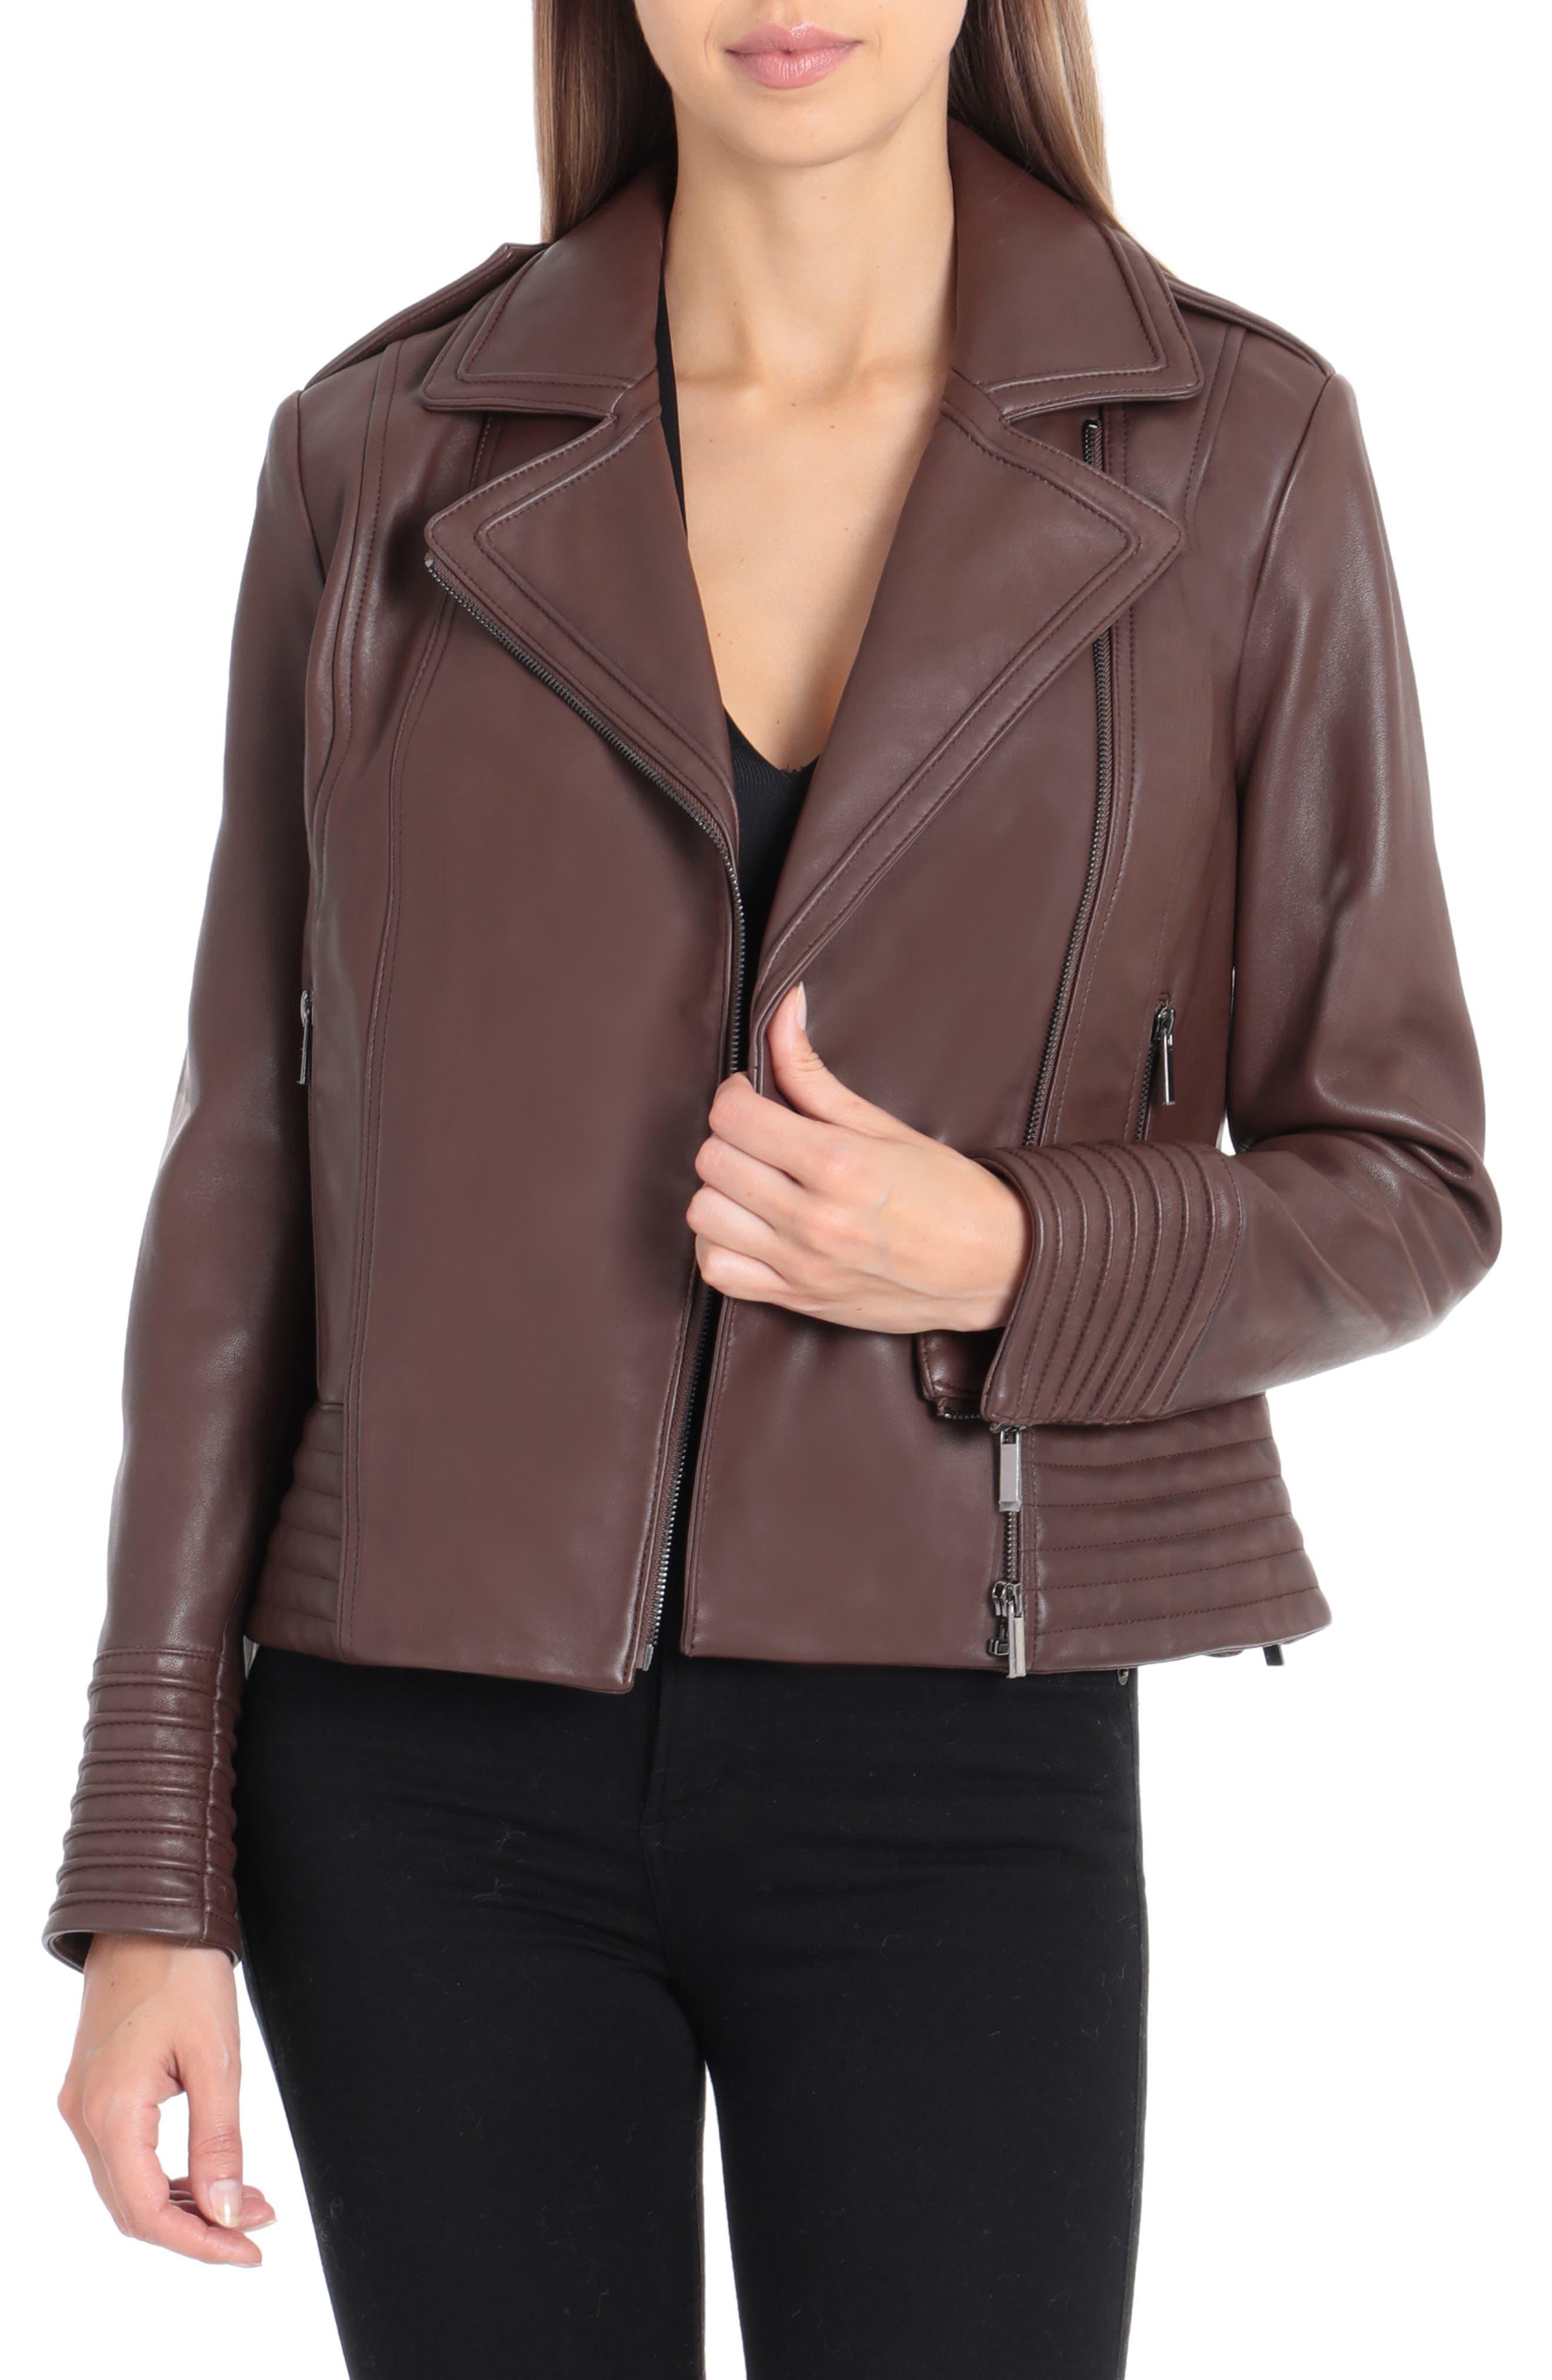 BADGLEY MISCHKA COLLECTION Badgley Mischka Gia Leather Biker Jacket, Main, color, 201